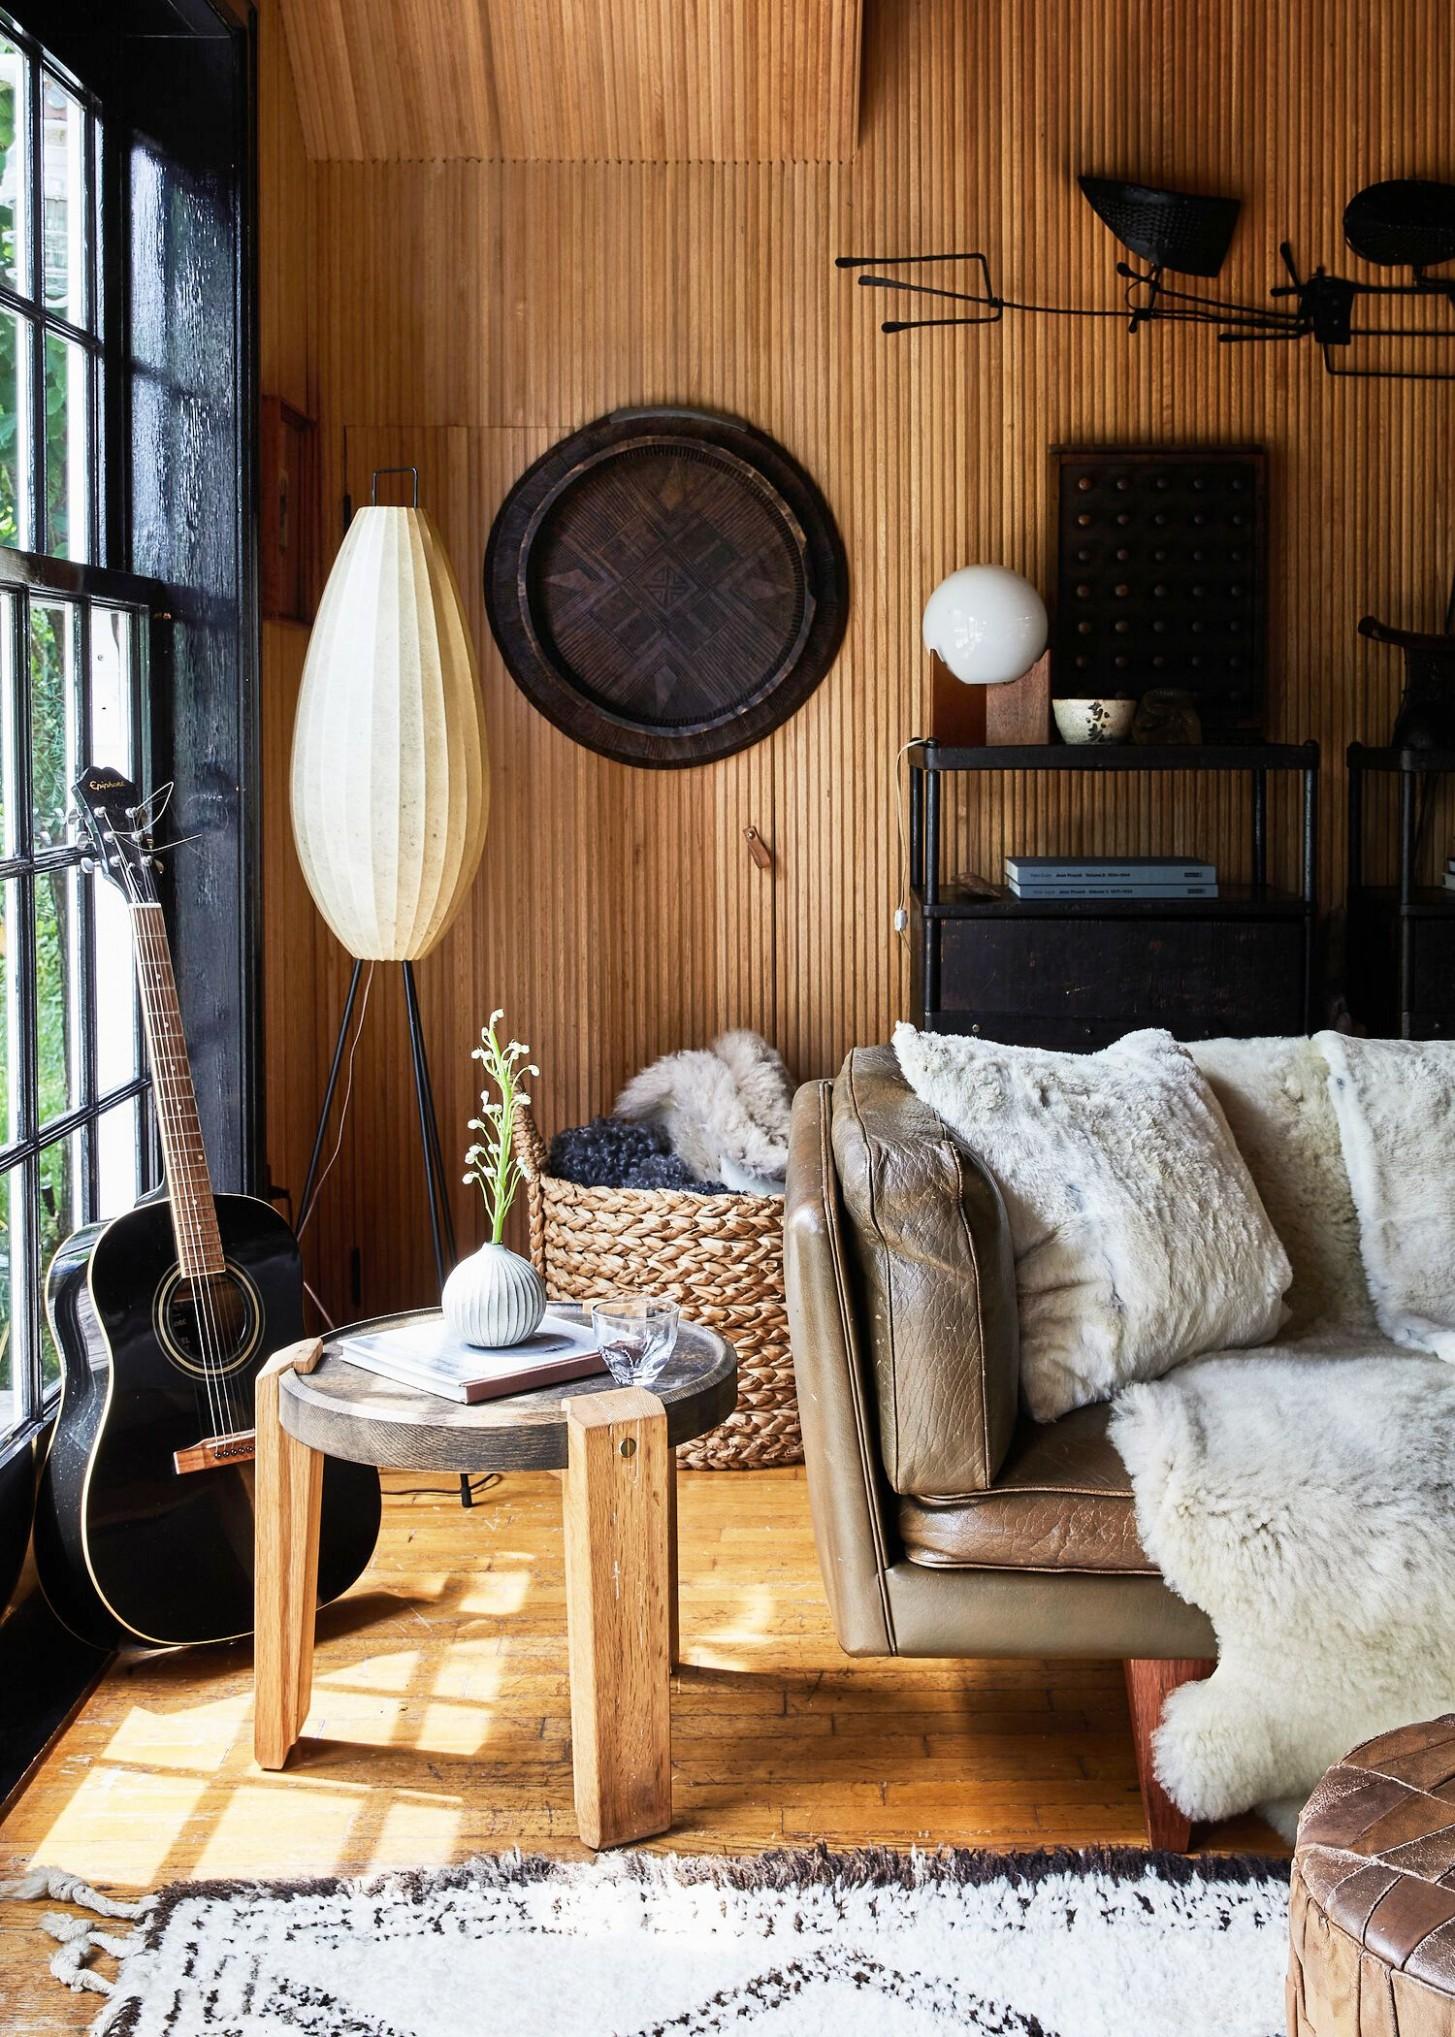 9 Bohemian Decor Ideas - Boho Room Style Decorating and Inspiration - Small Apartment Decorating Ideas Boho